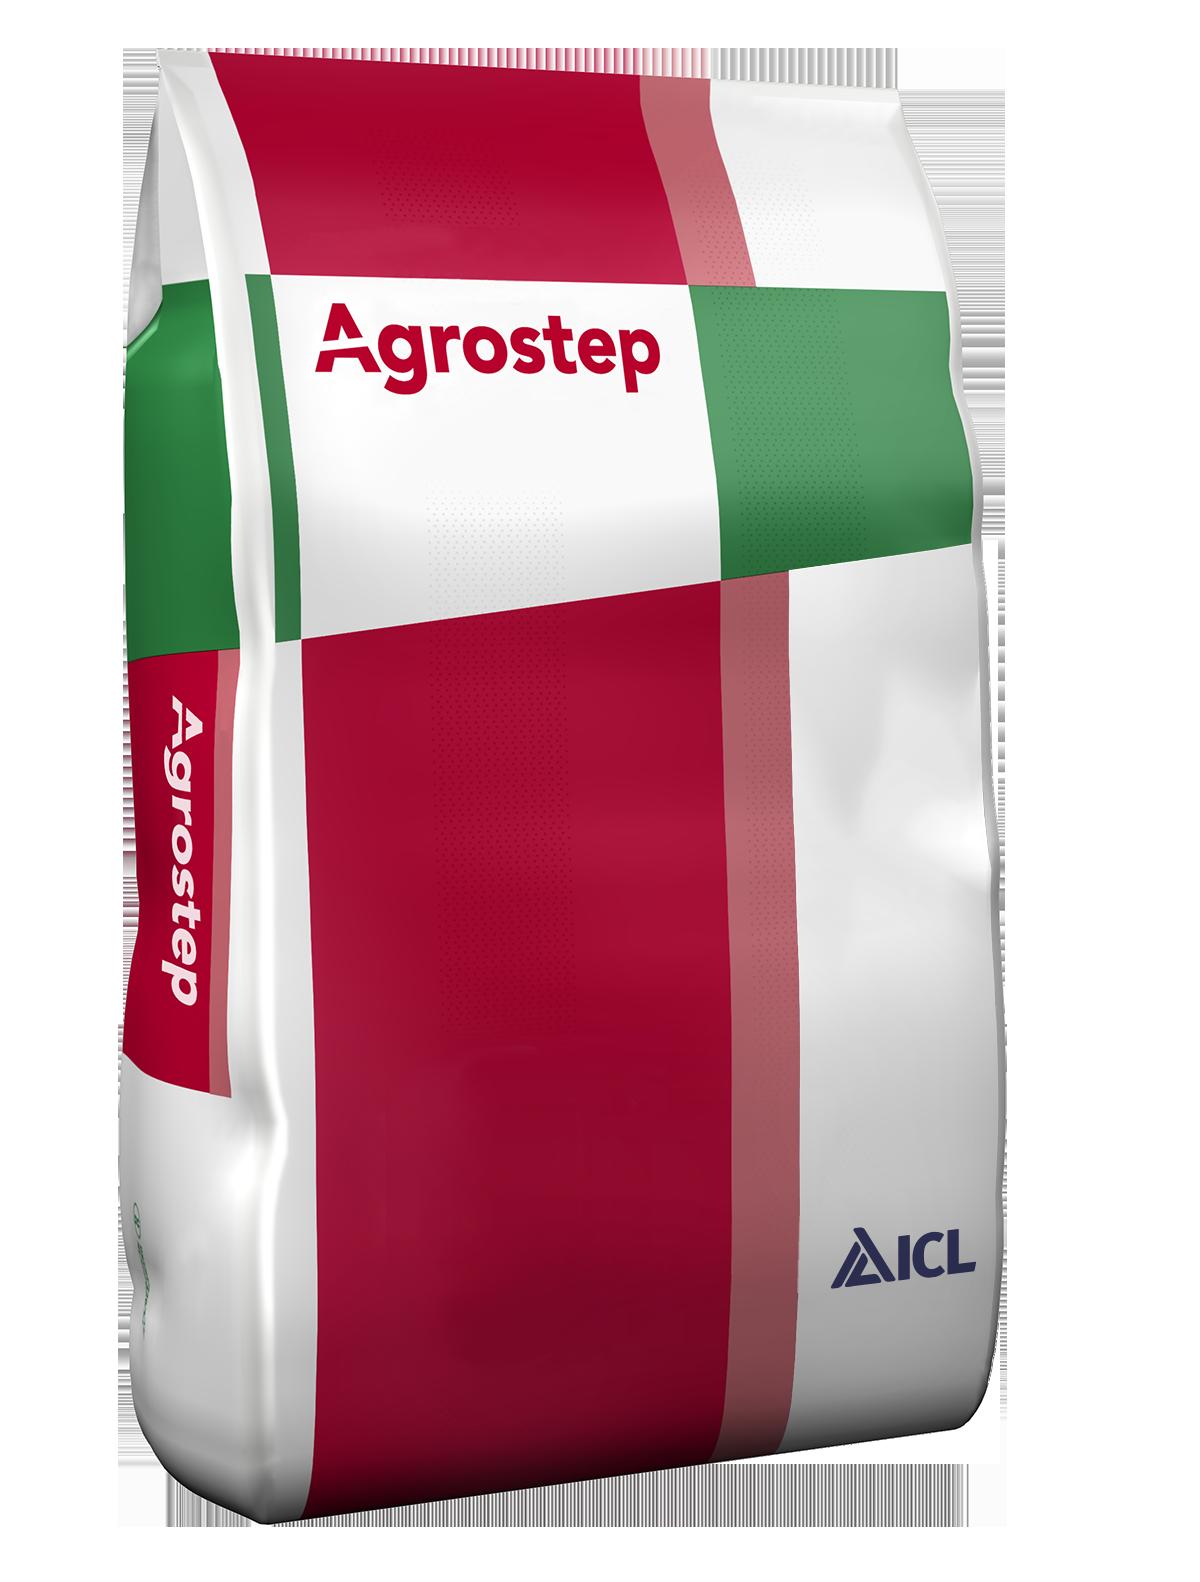 Agrostep